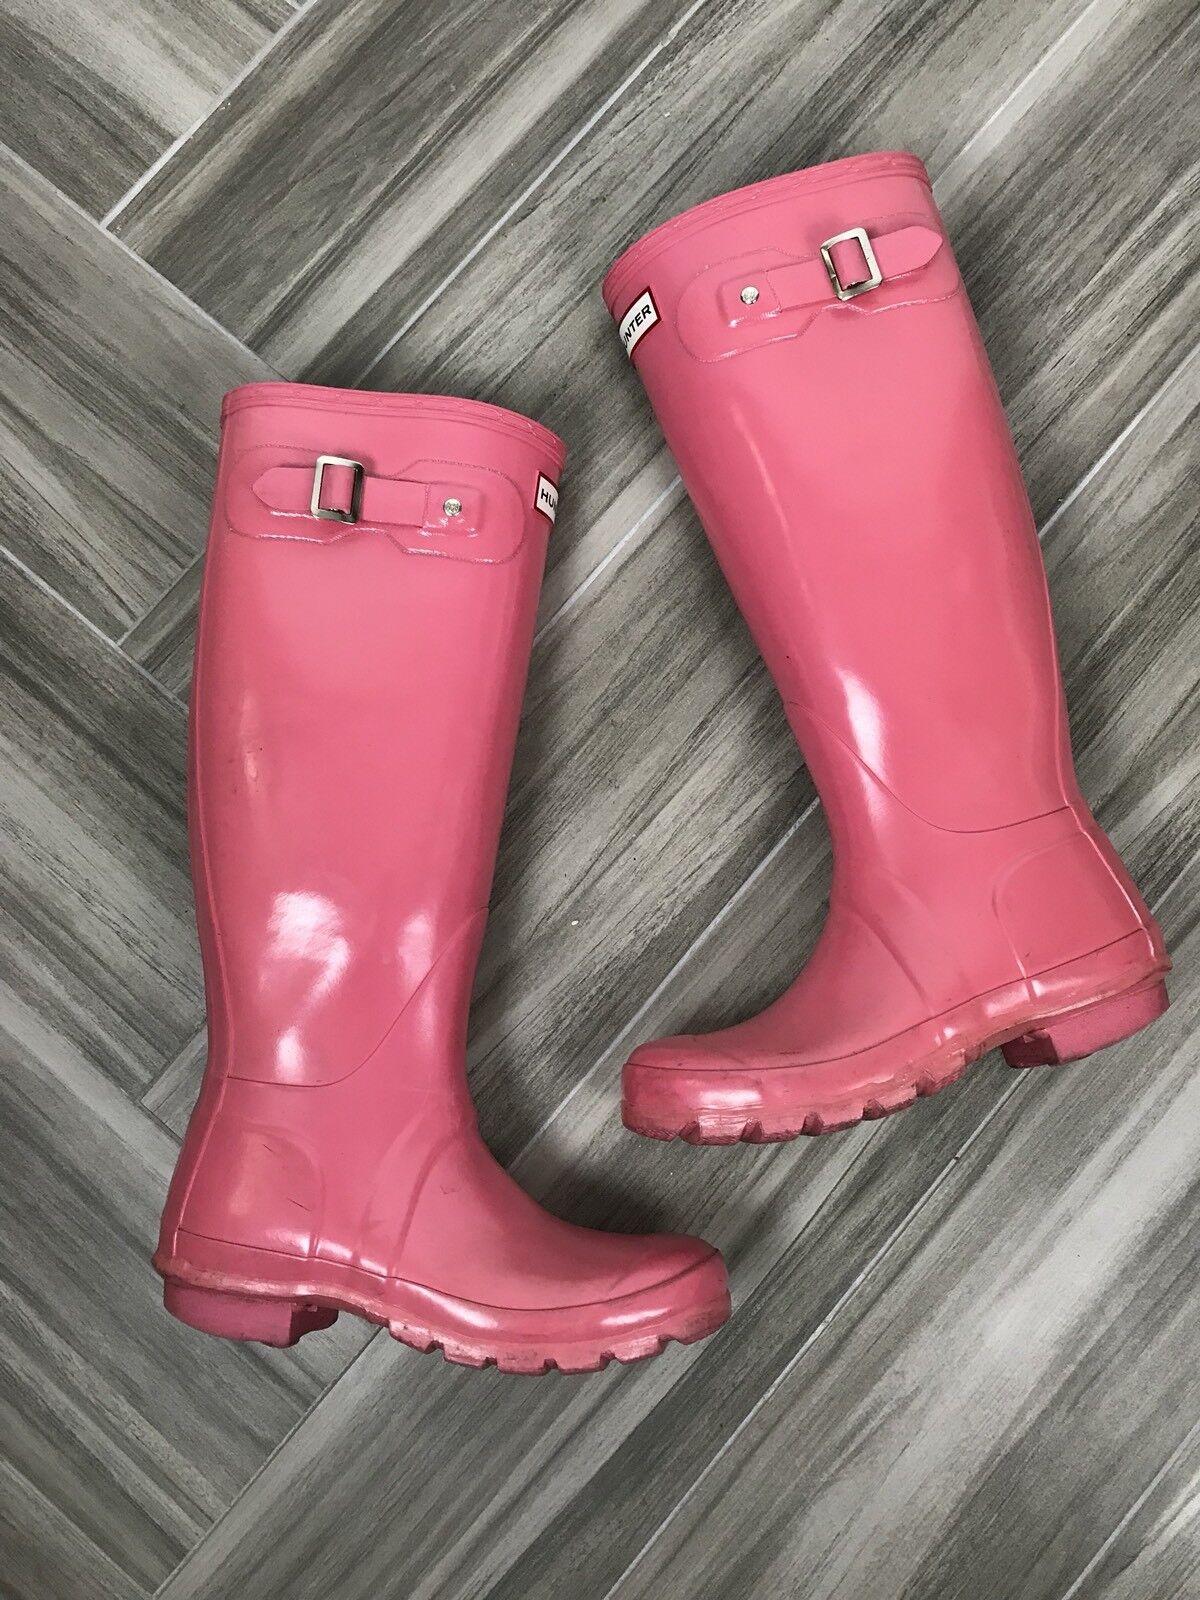 Hunter Original Gloss Tall Rain Stiefel Größe 5 Pink Casual Winter Waterproof